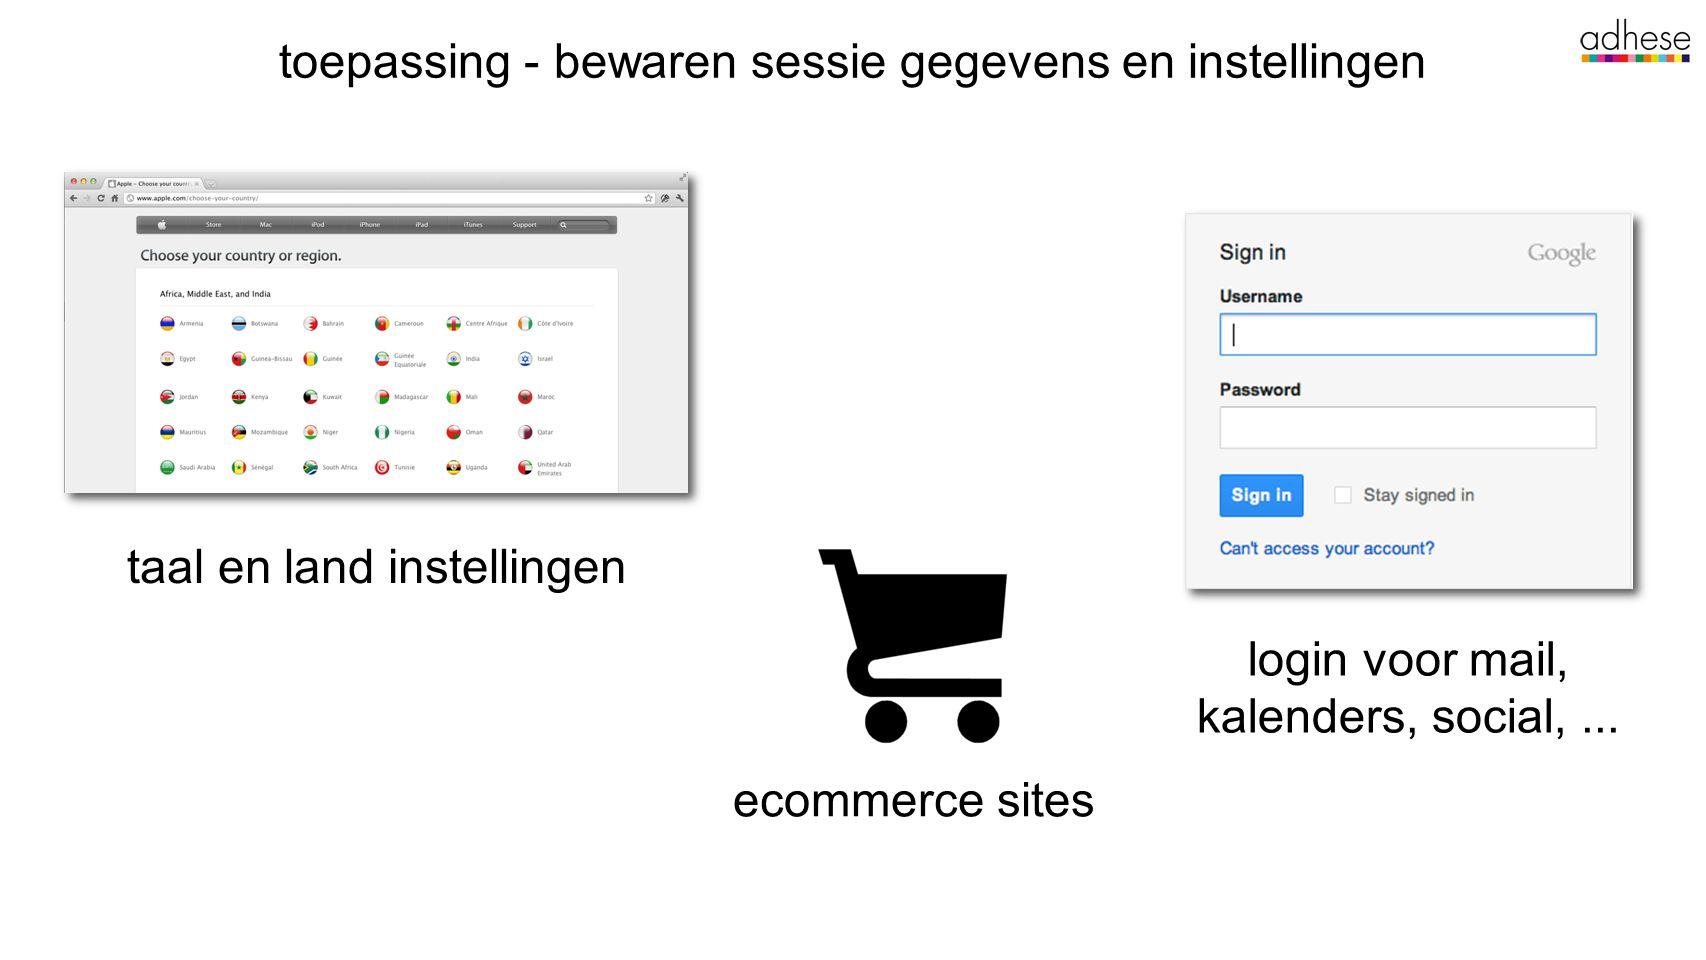 toepassing - analytics anonieme identificatie voor analytics user identificatie voor social features